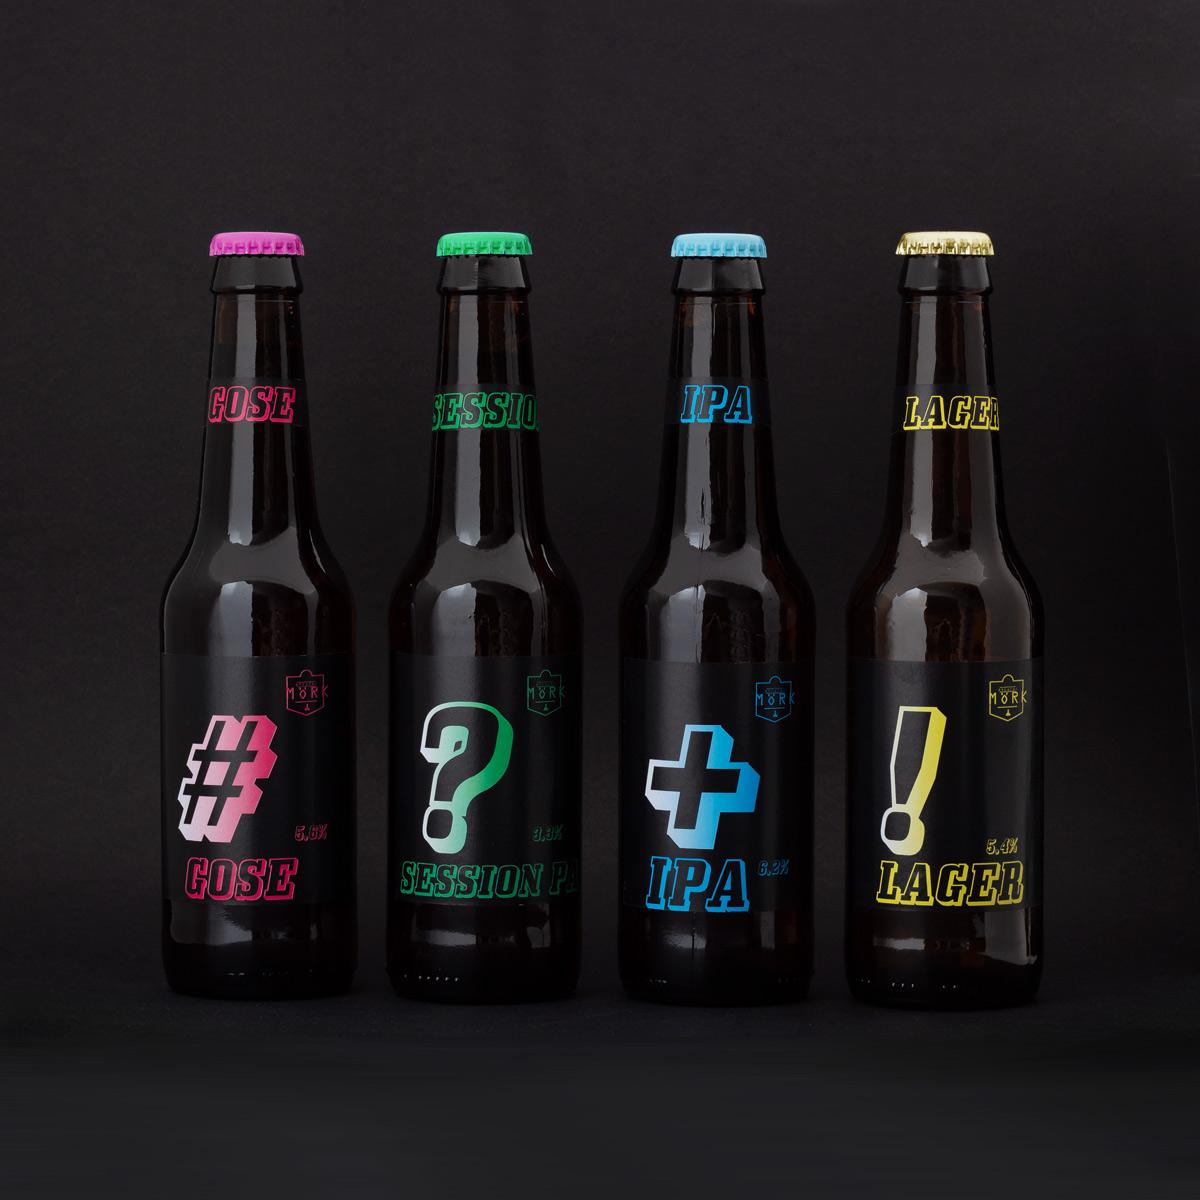 Mörk Craft beers - branding & design by Jaani Vaahtera, Vaahtera & Lönneberga